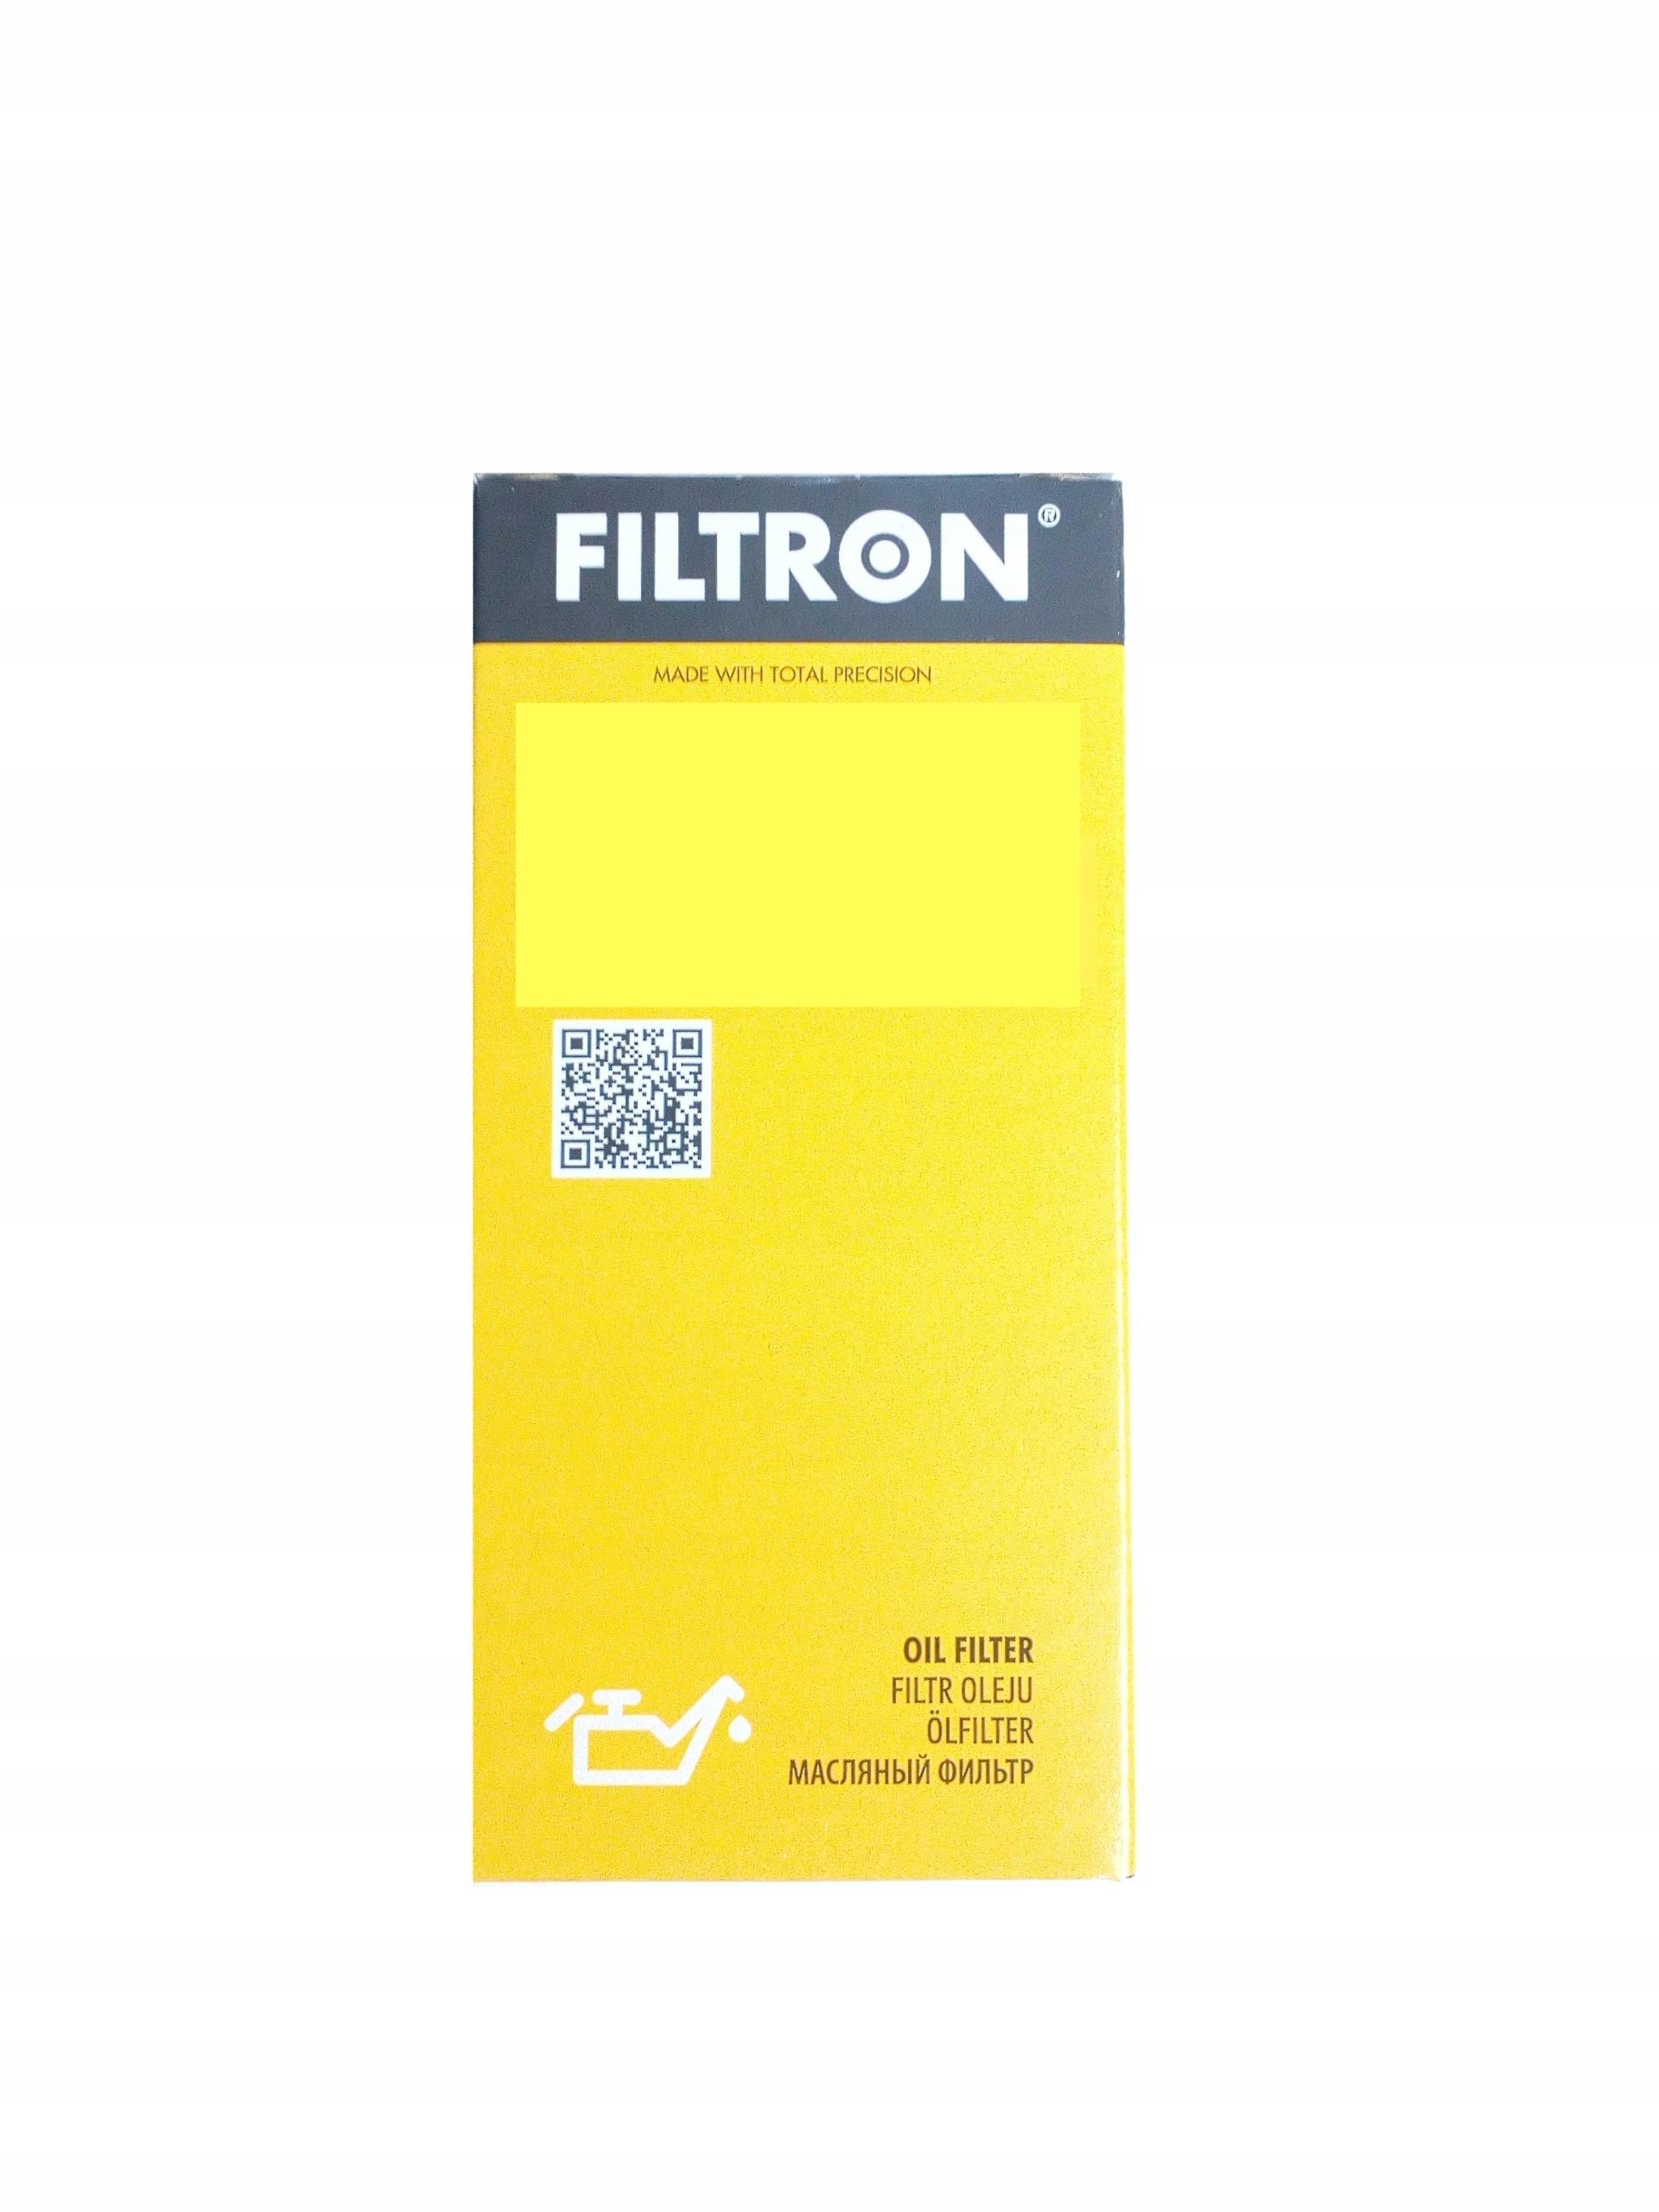 Filtr Oleju Filtron BMW 3 E21 E30 OP556